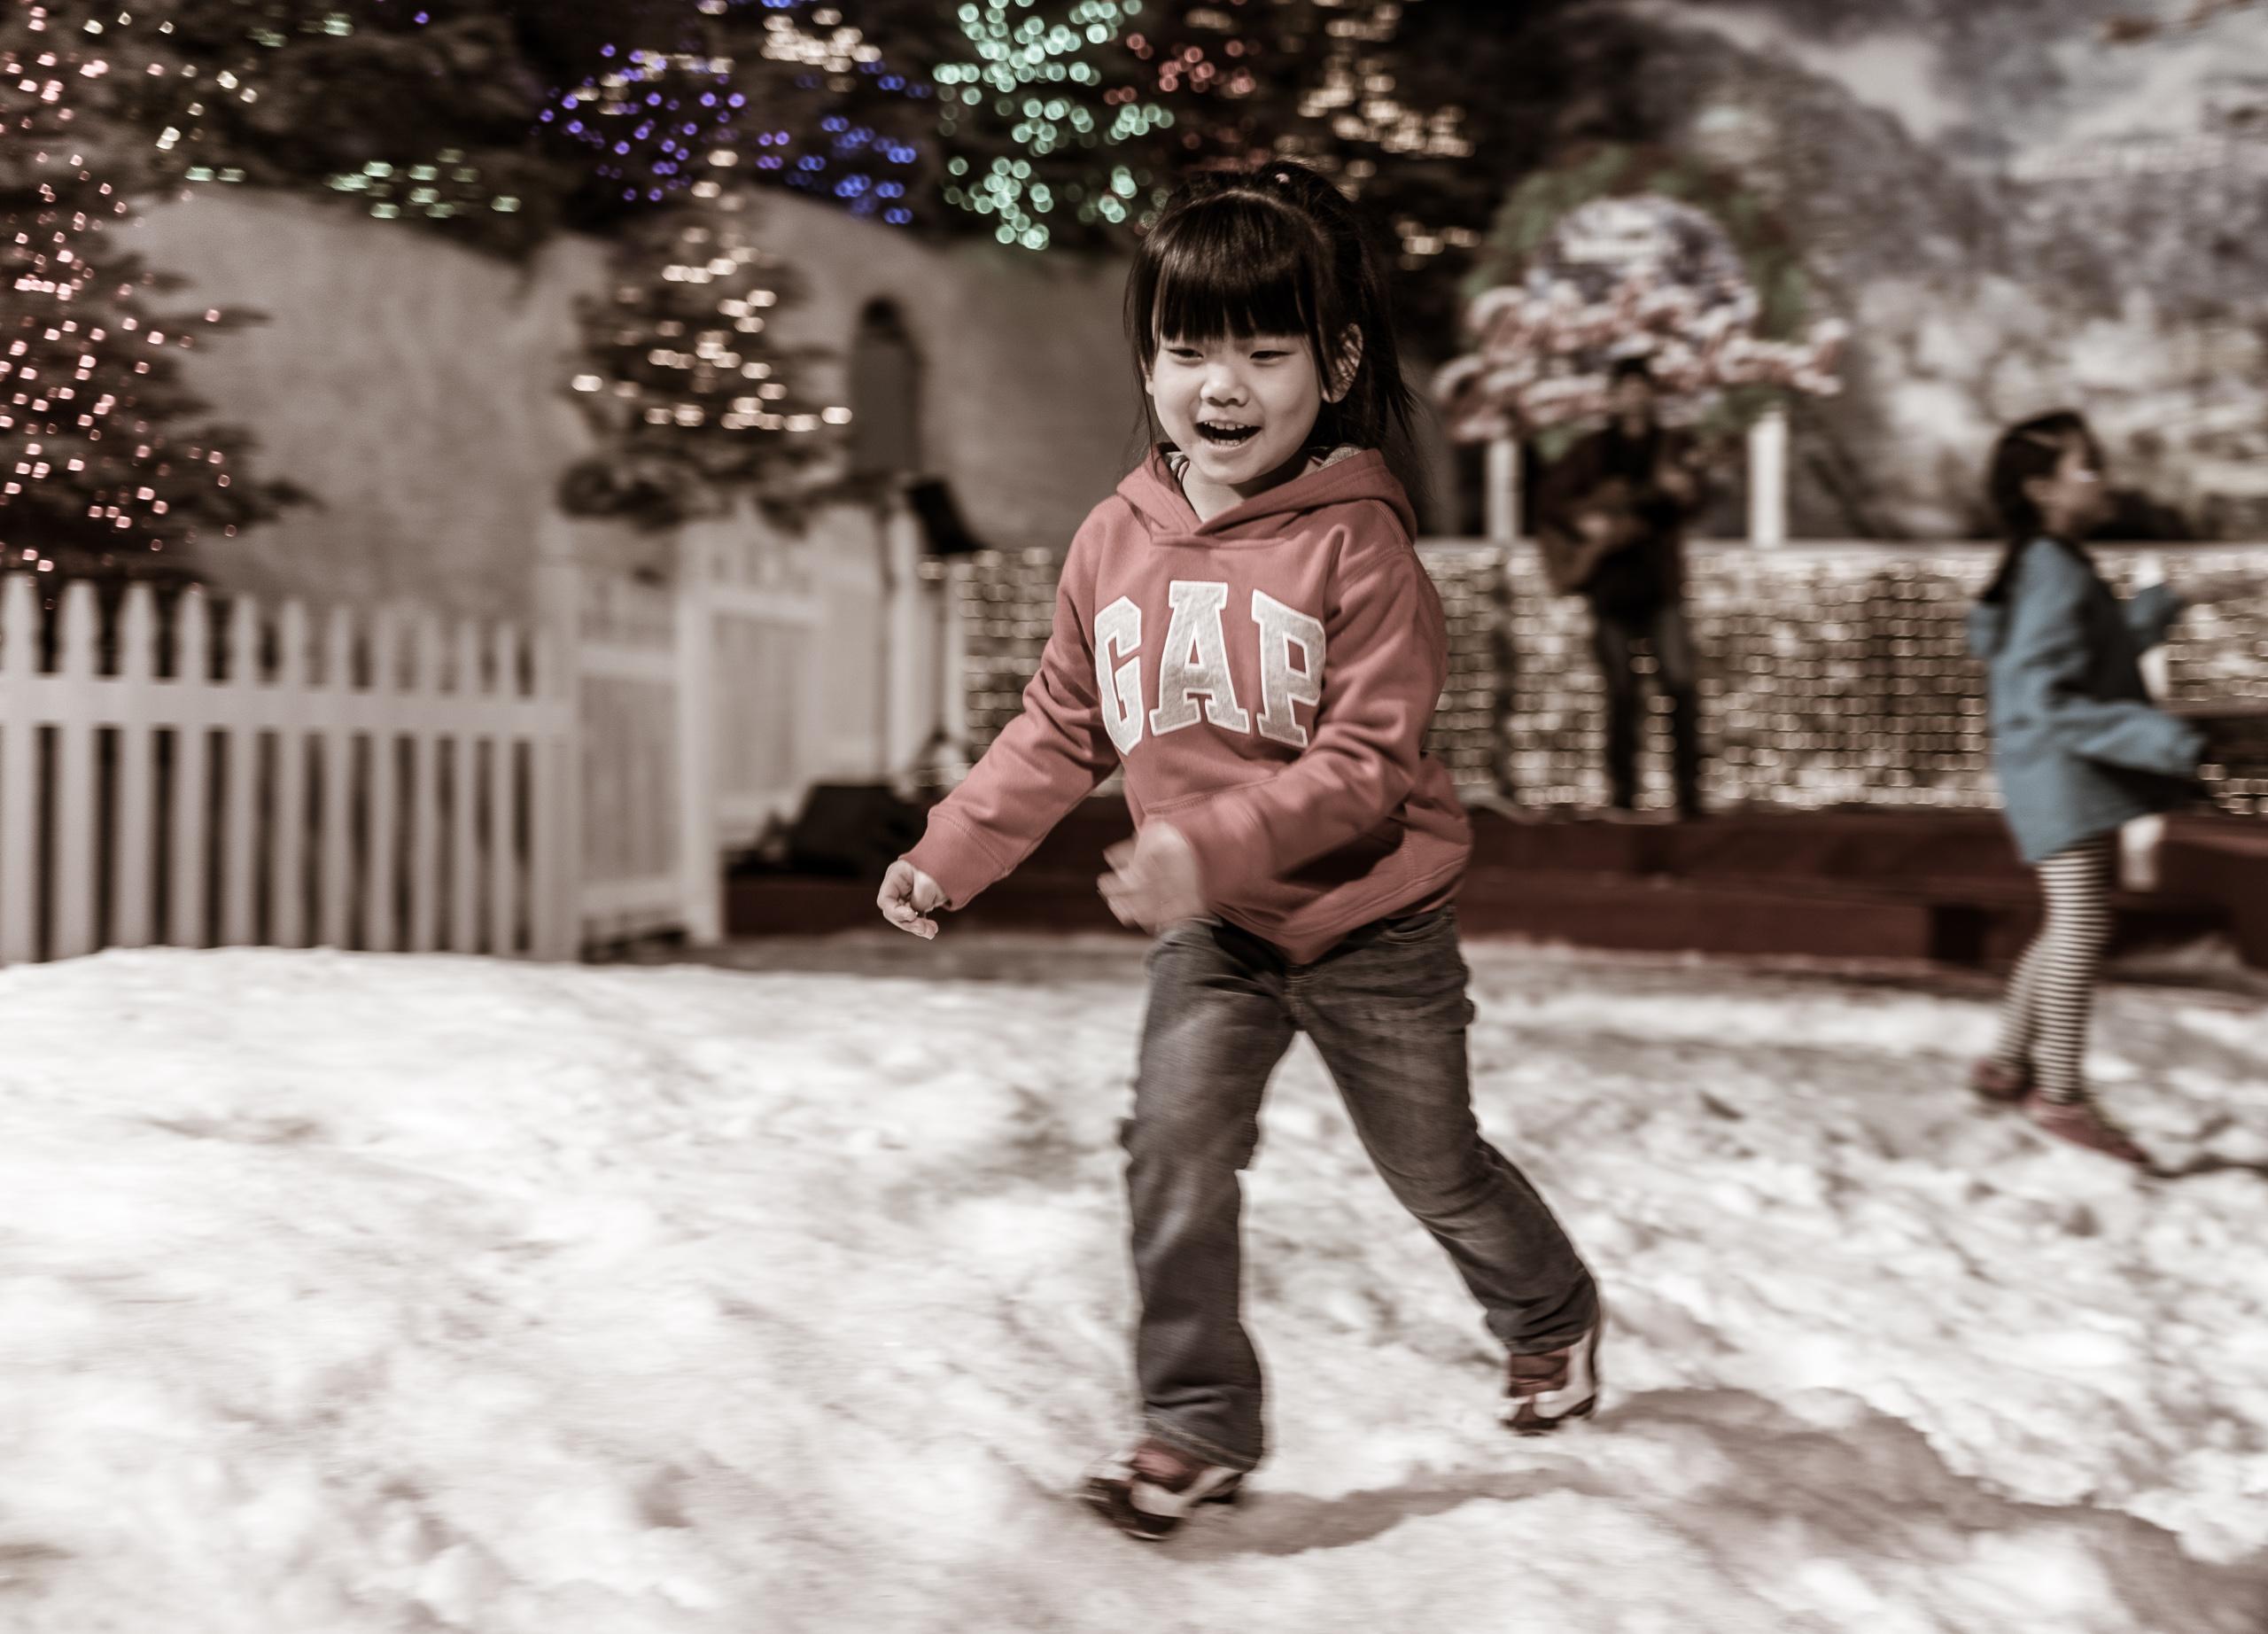 Running in the snow @ L. Ron Hubbard's Winter Wonderland